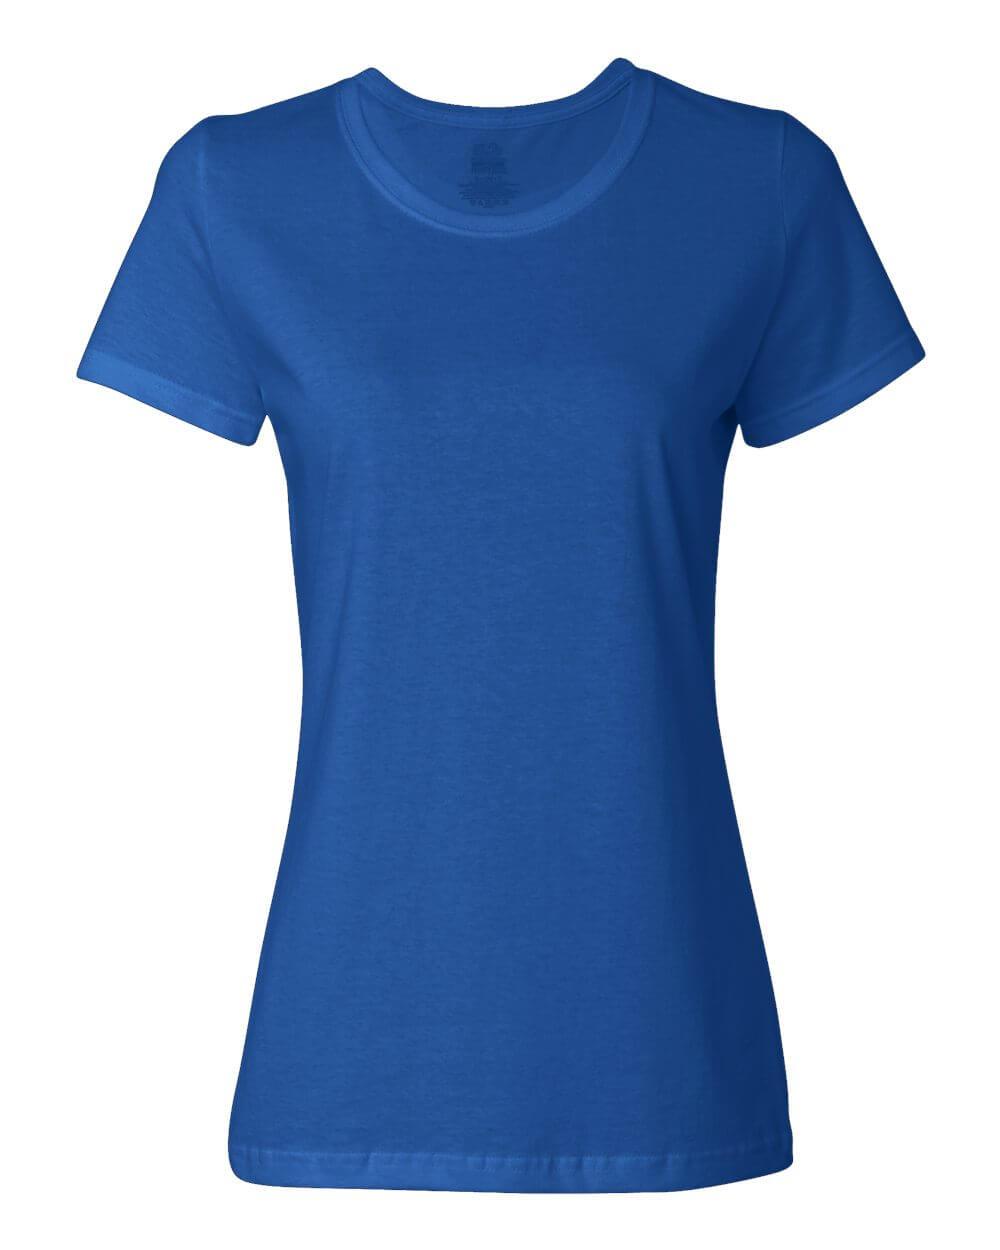 Fruit_of_the_Loom_L3930R_Royal Blue Custom T Shirts